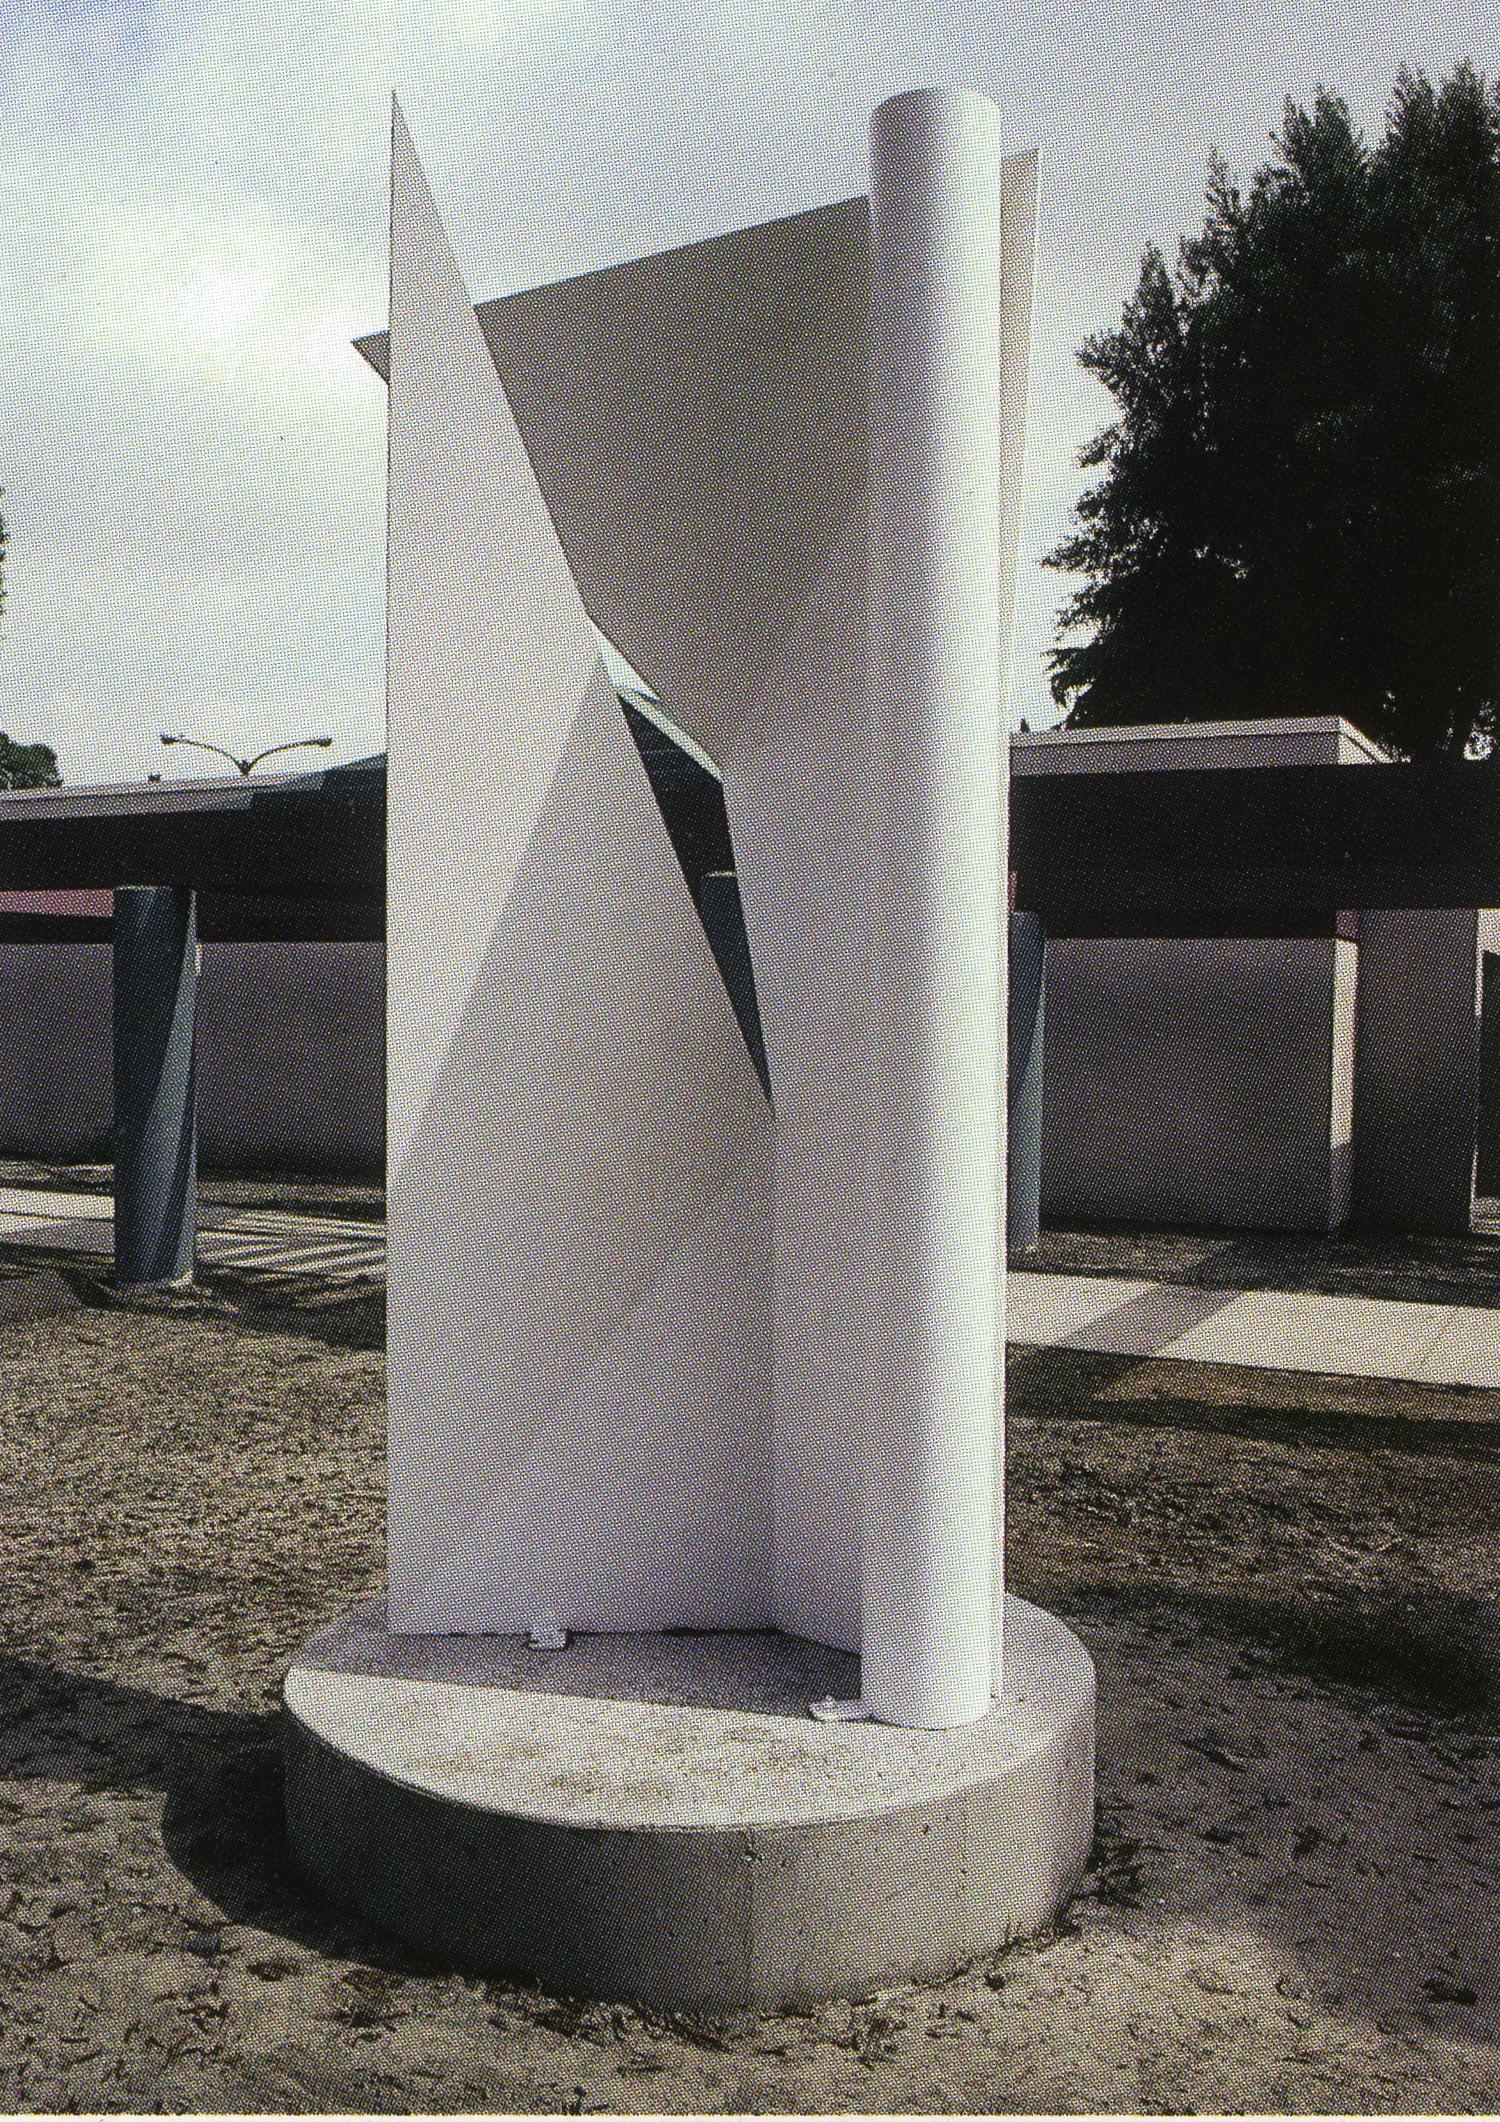 Downey Museum, Downey, California; 1993.  Atlas II.  10' x 5' x 5'